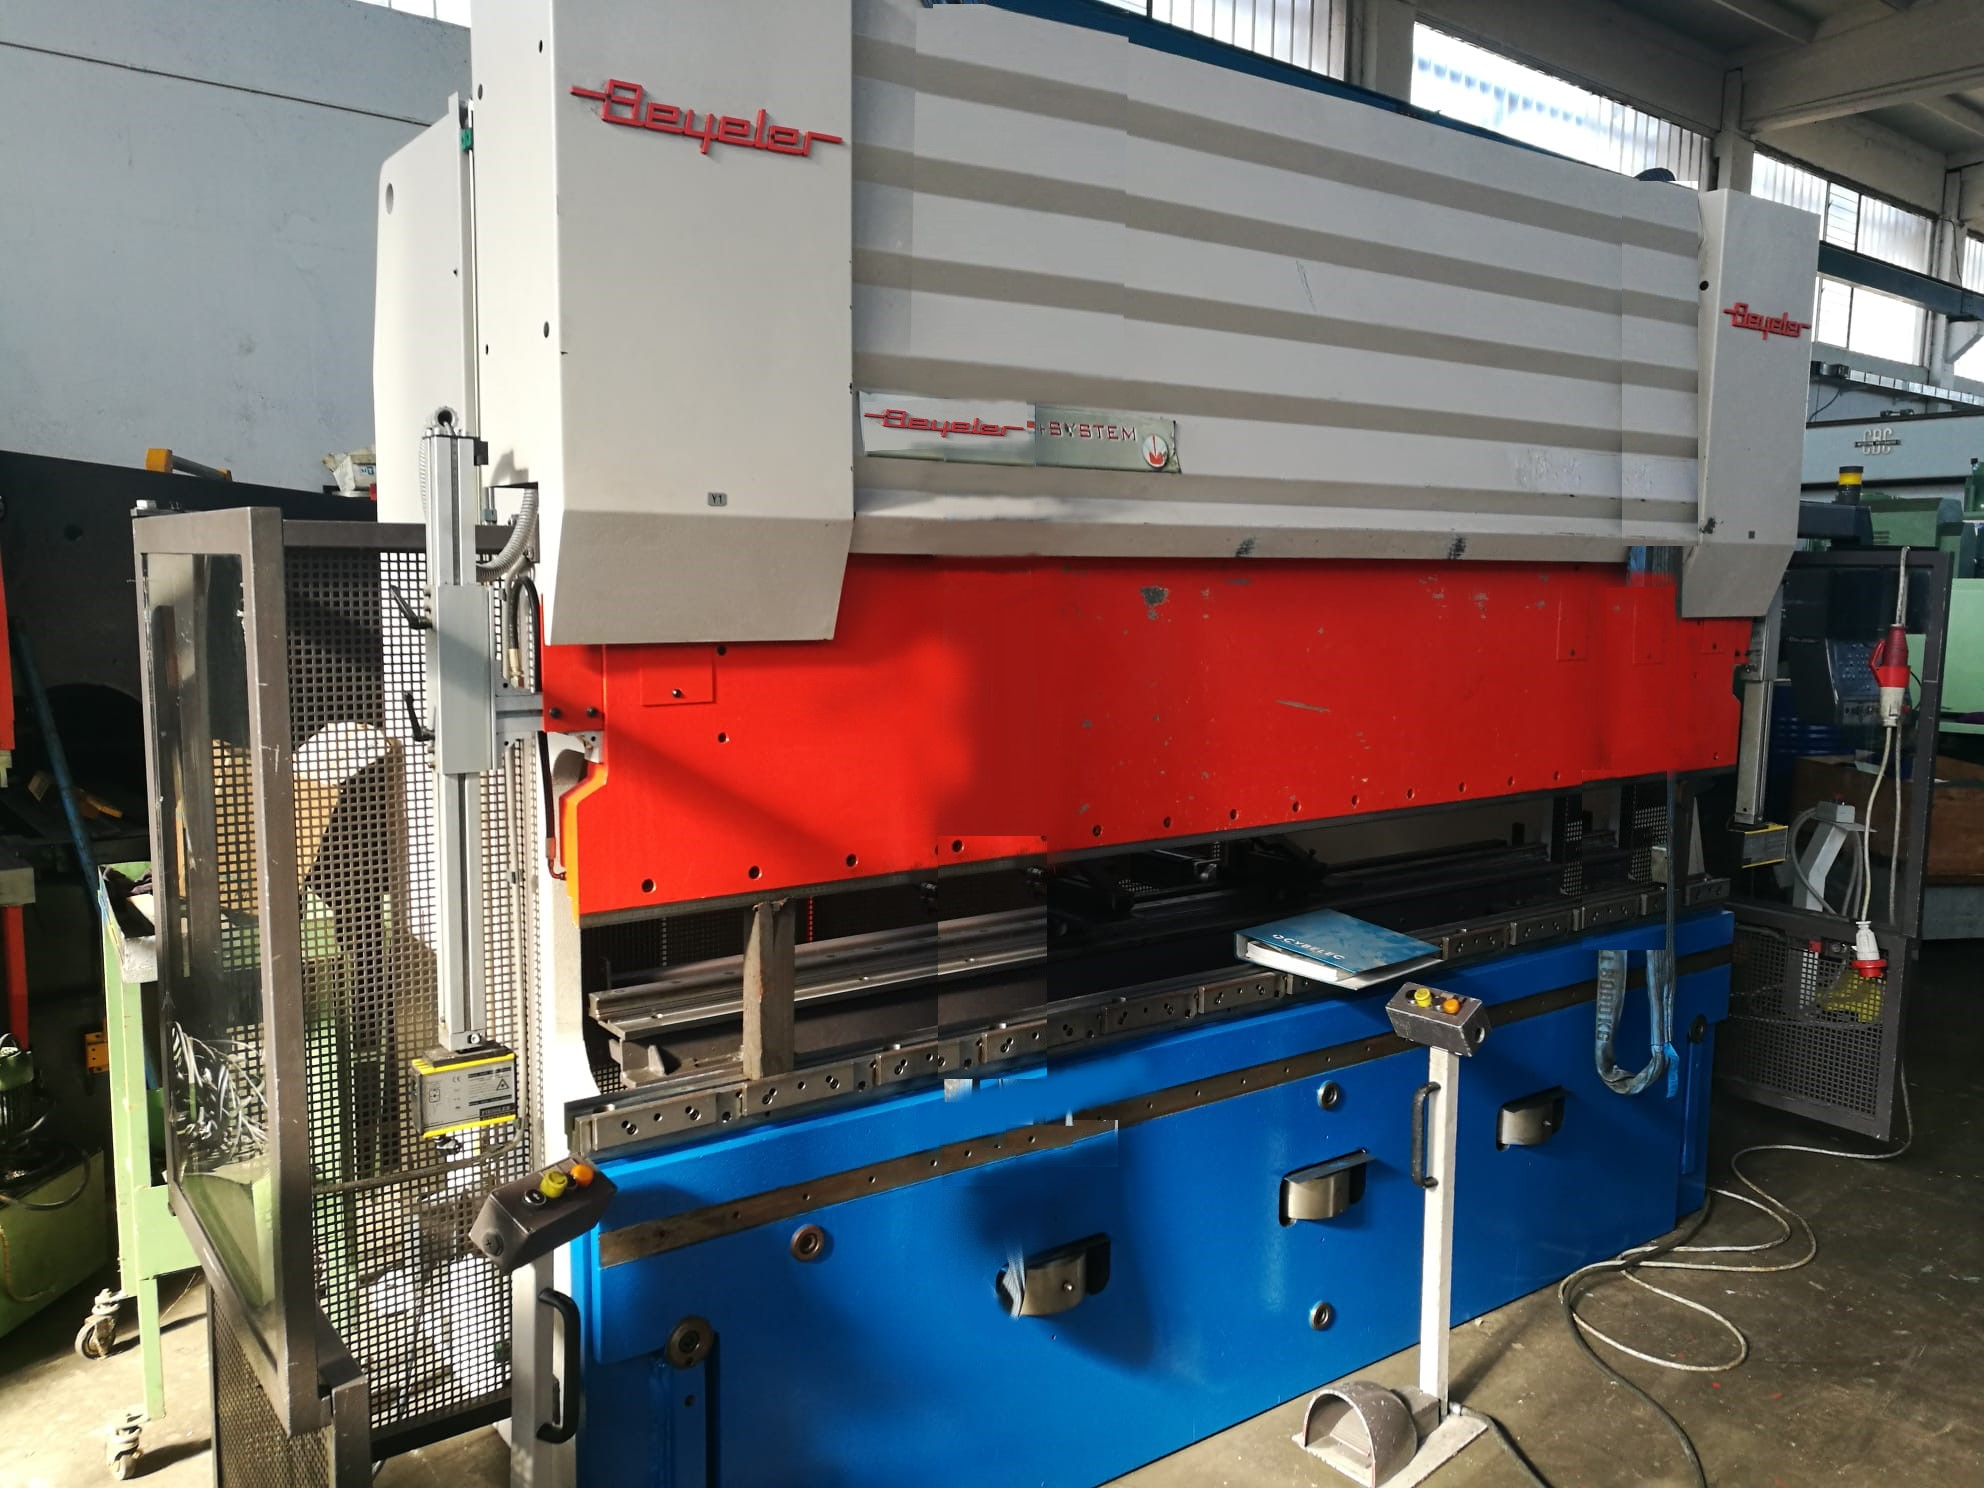 Piegatrice Beyeler pr 6 3100 mm x 100 ton 8 assi in vendita - foto 1